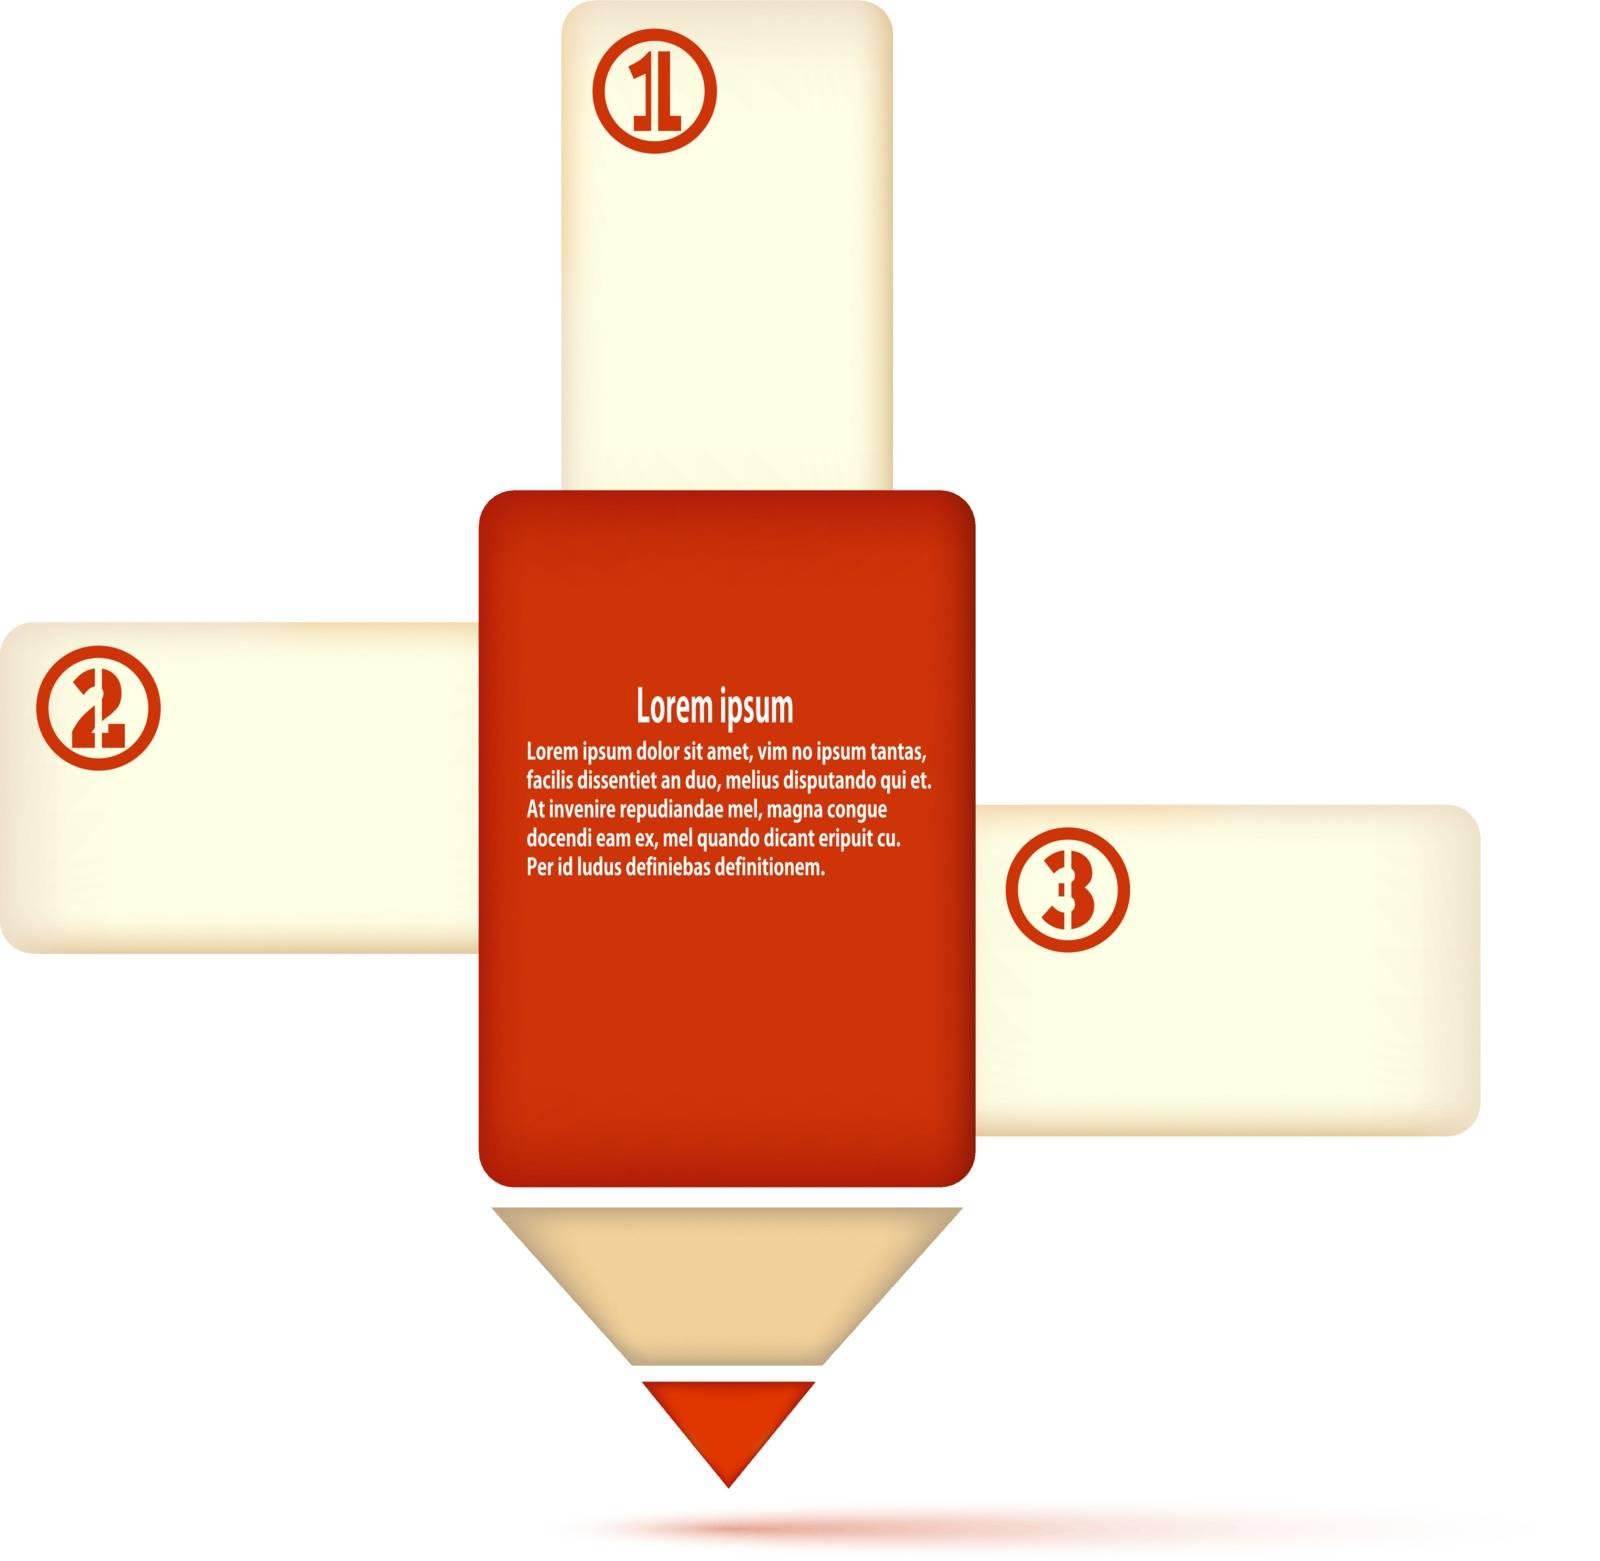 Design element infographic